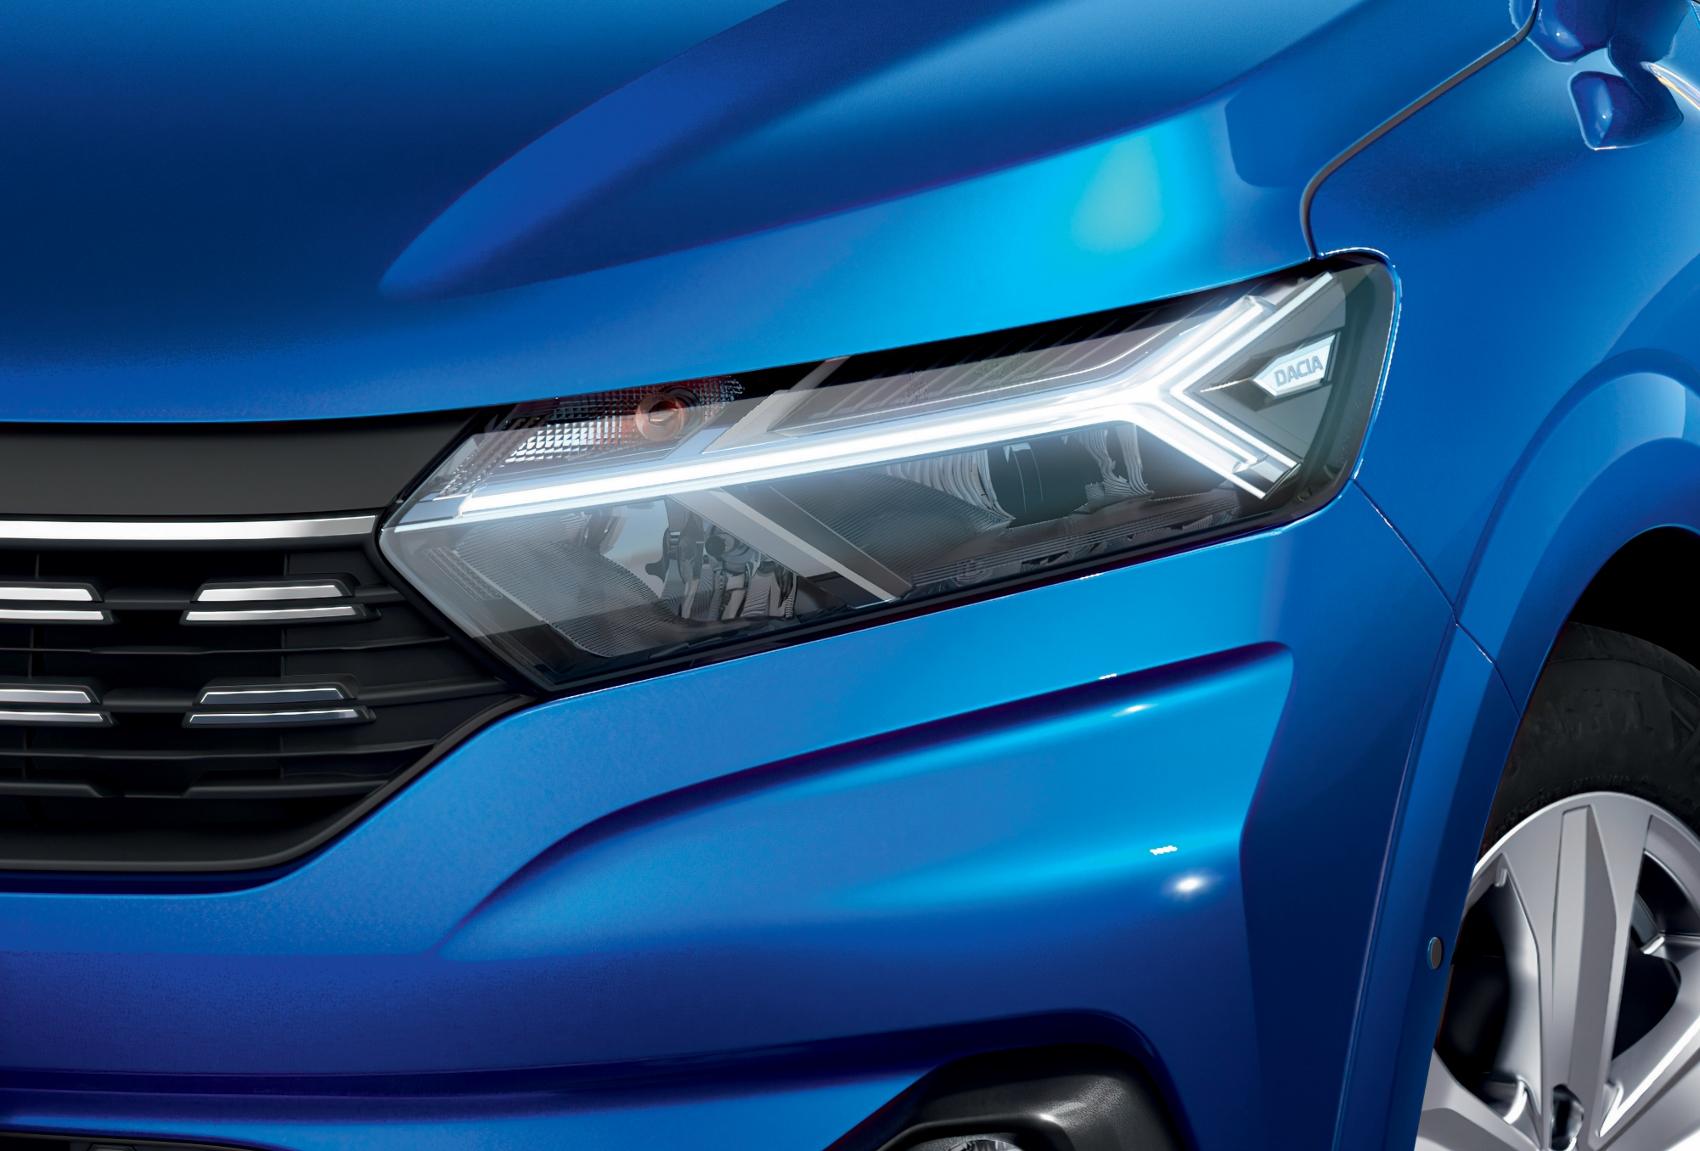 2020 - New Dacia SANDERO (6) (1700x1151)